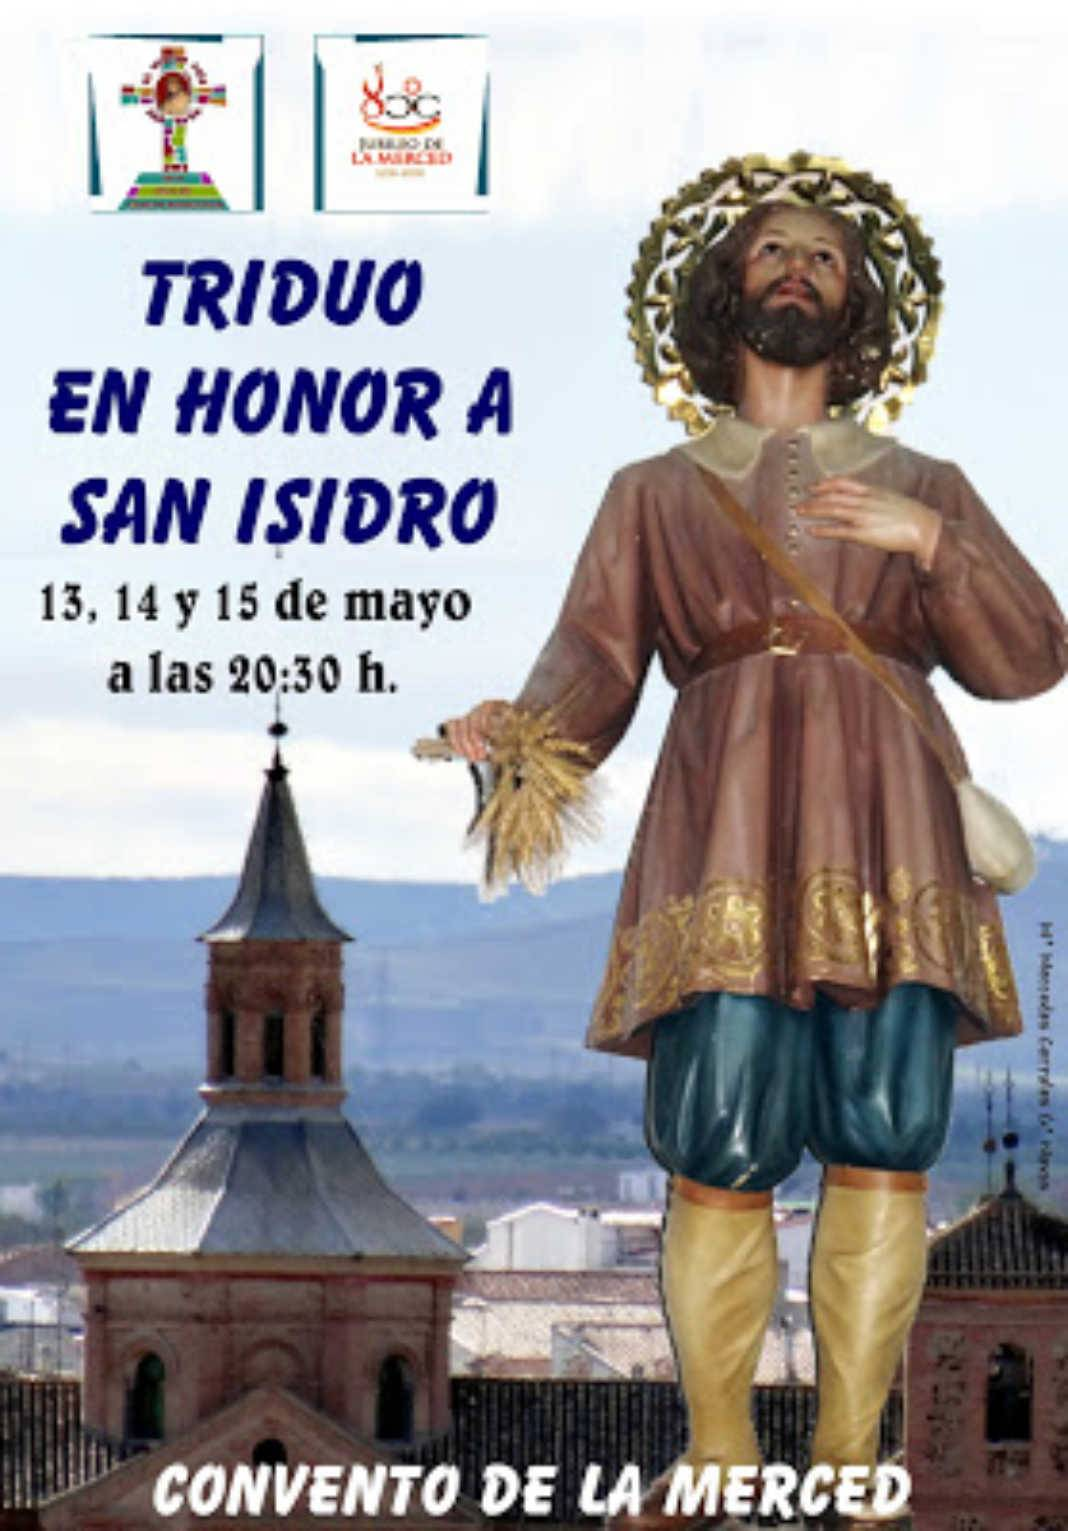 Triduo en honor a San Isidro 2